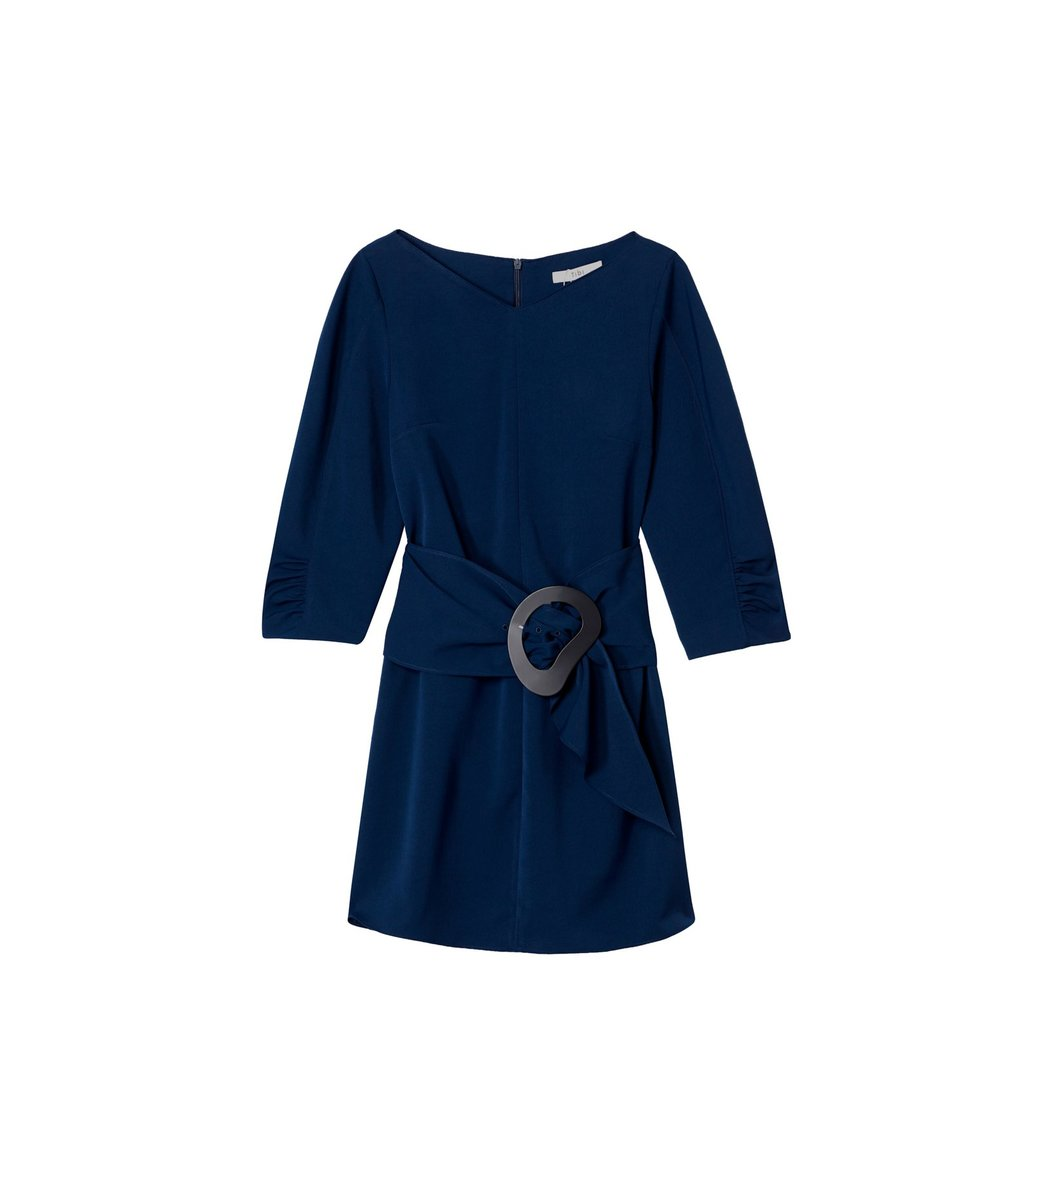 Tibi Dresses Drape Twill Shirred Sleeve Dress with Removable Belt